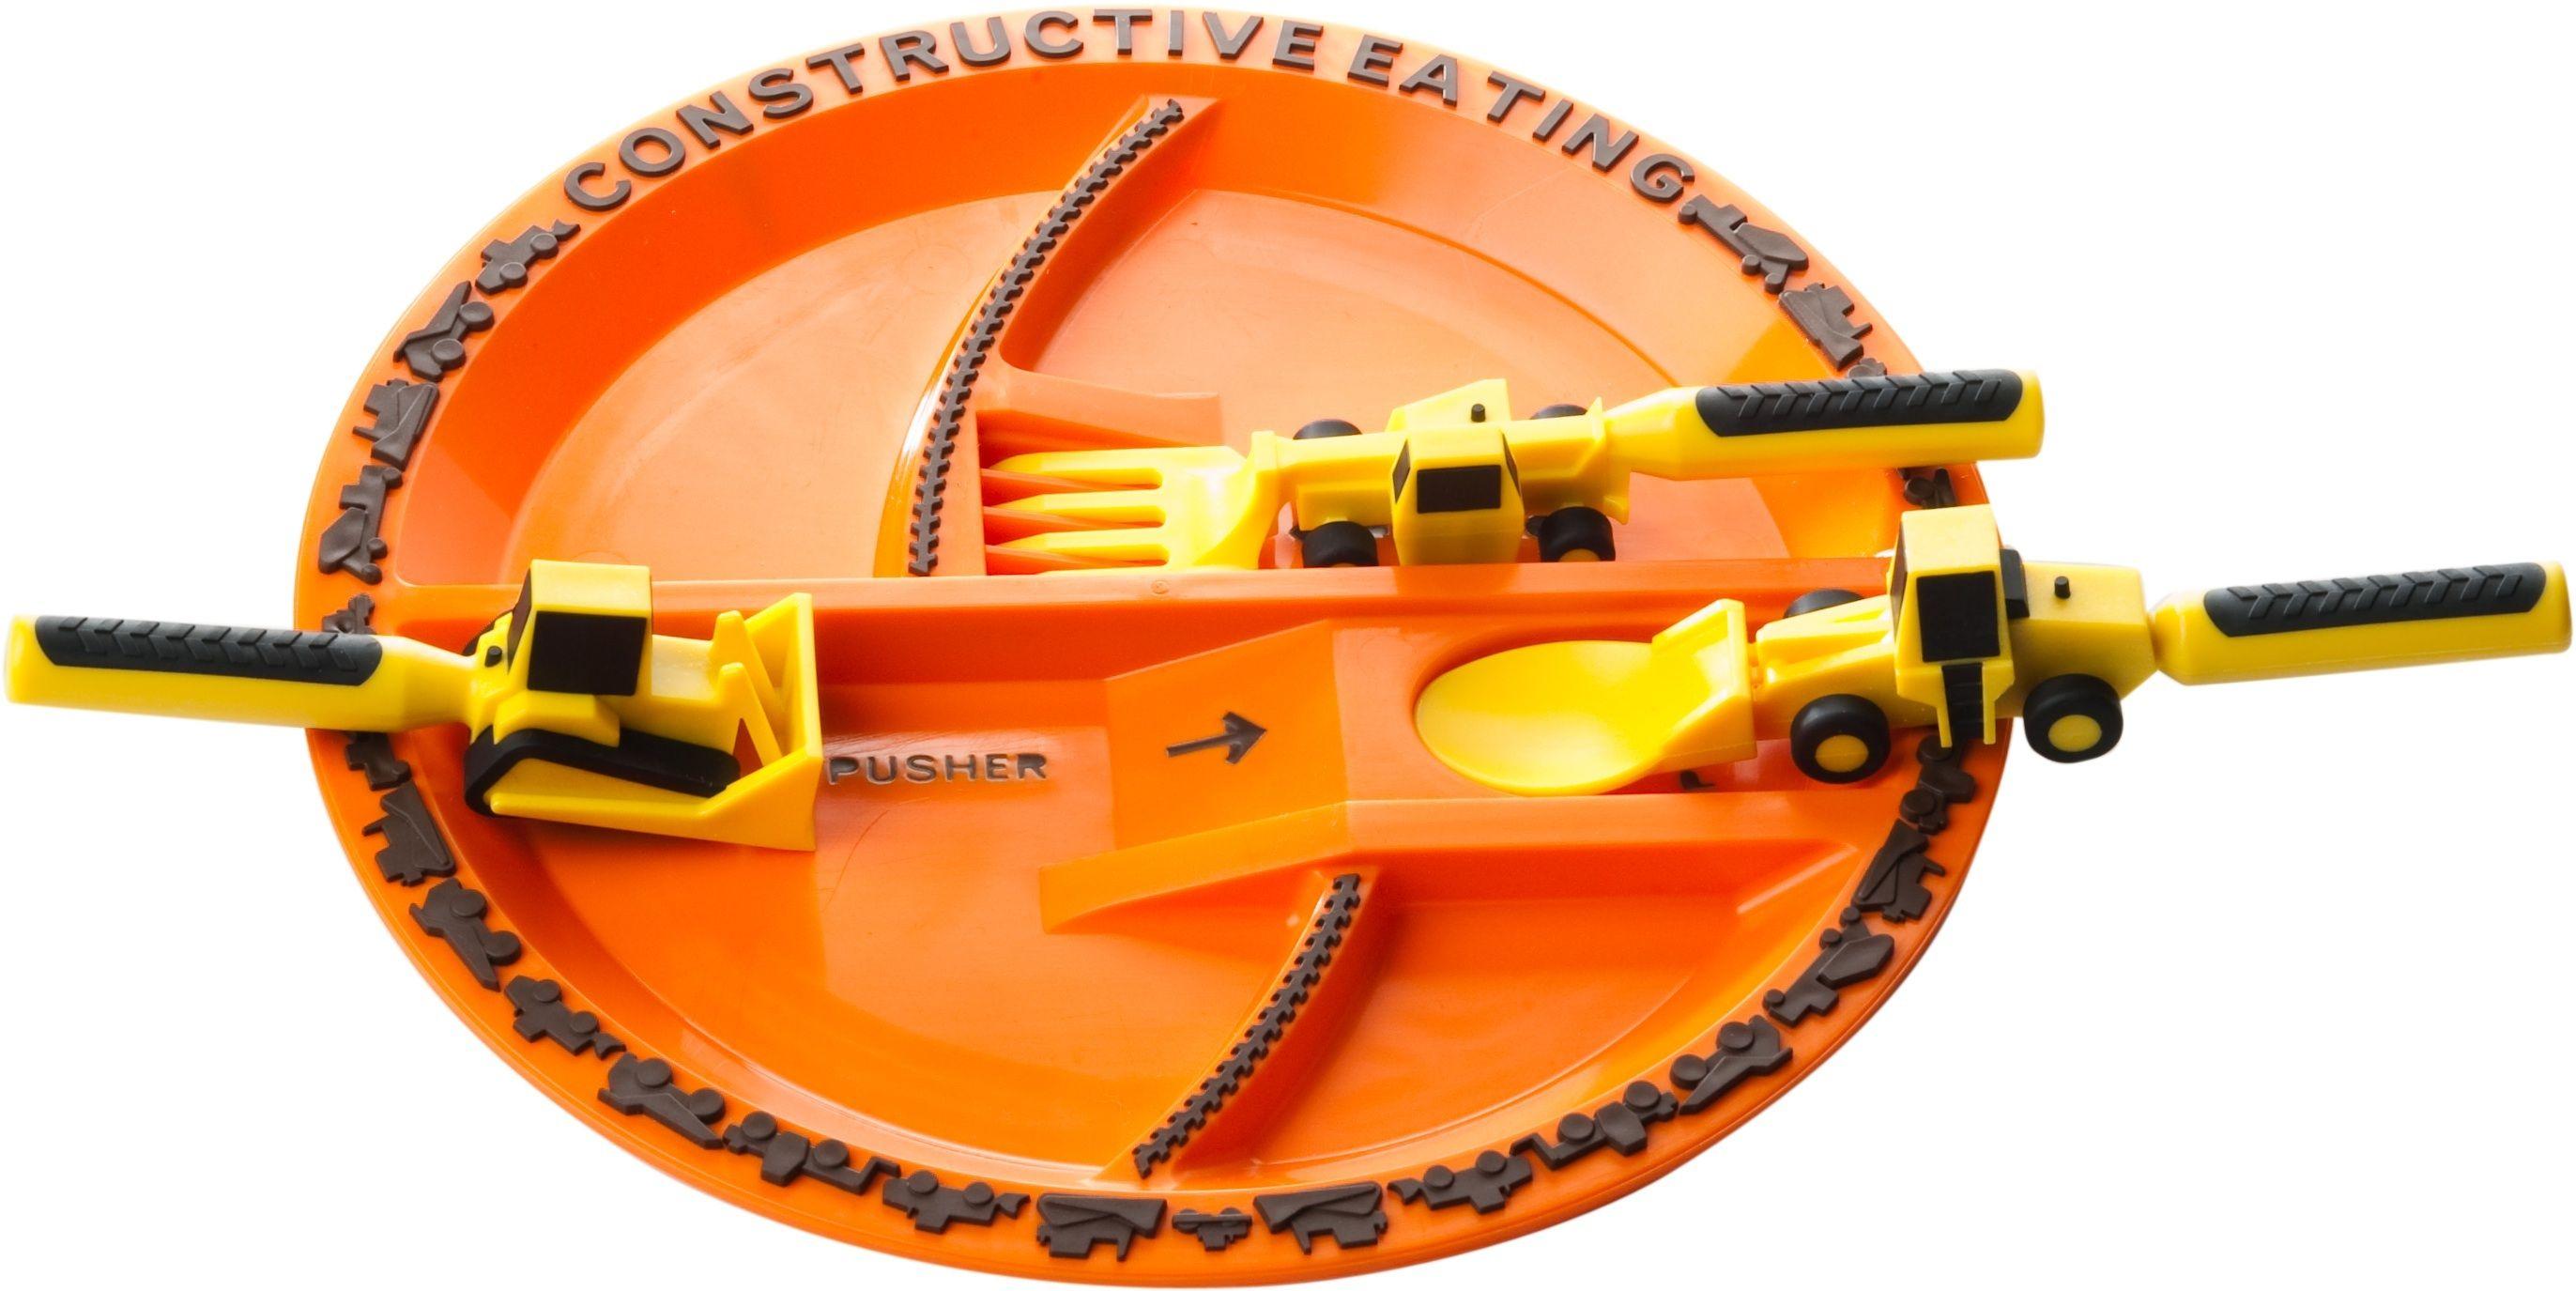 Constructive Eating Set 3 Construction Utensils with Construction Plate  sc 1 st  Pinterest & constructionutensils #construction #digger #dozer #excavator ...